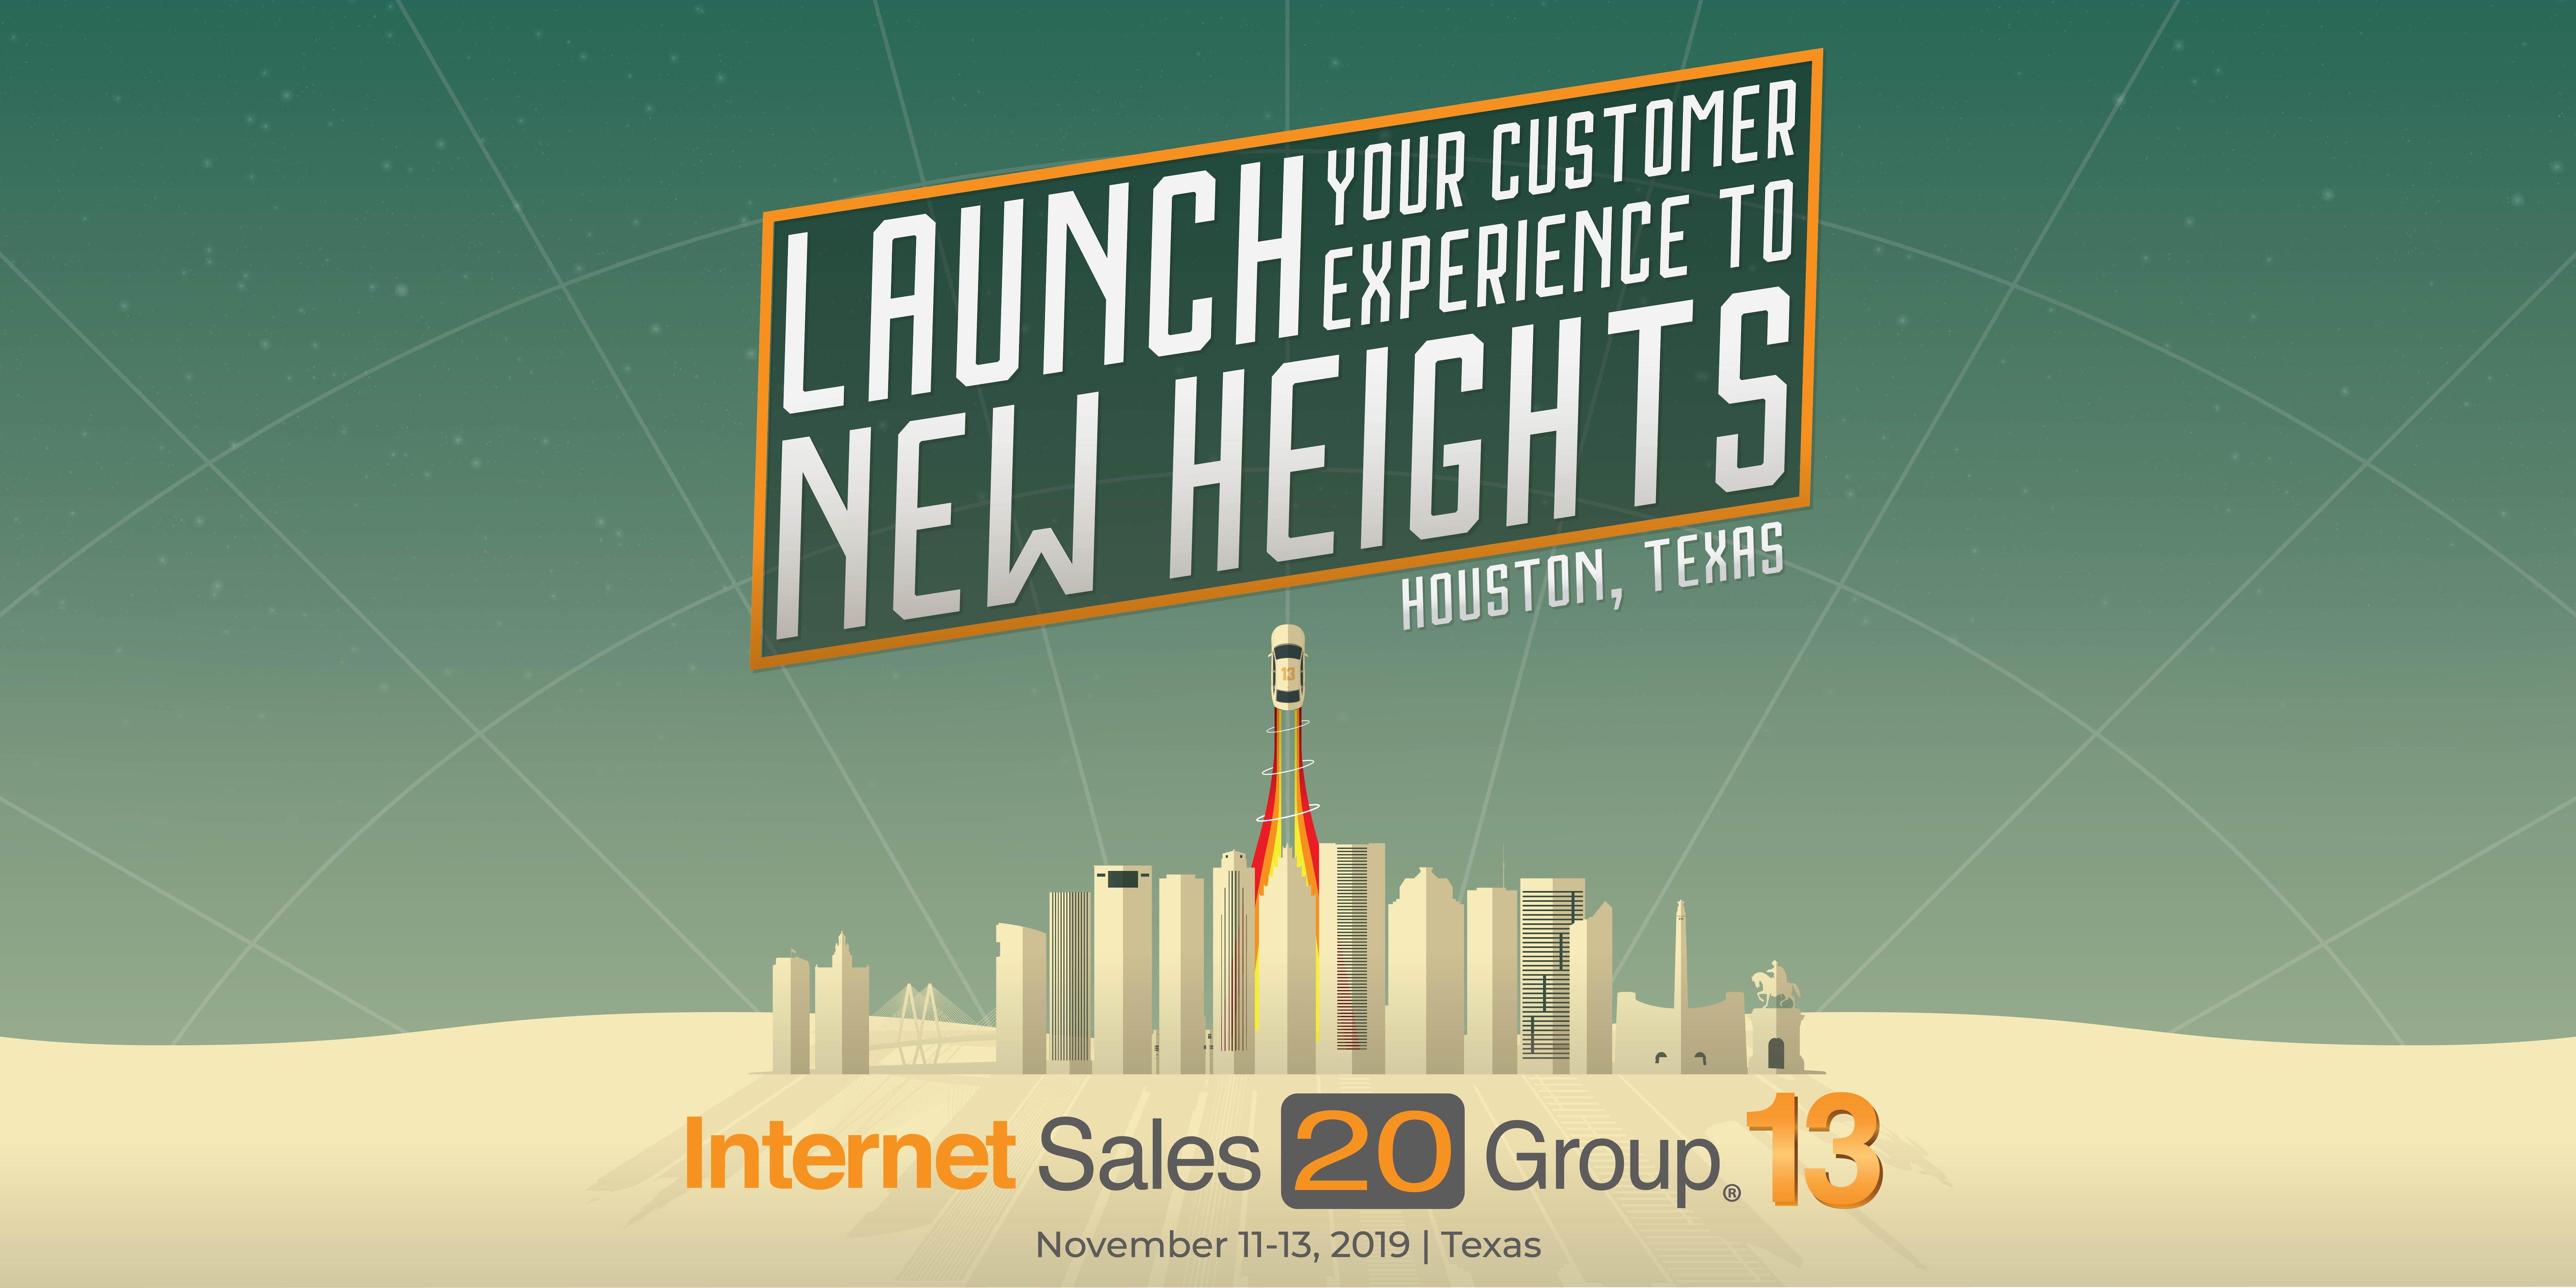 Internet Sales 20 Group 13 - Houston TX